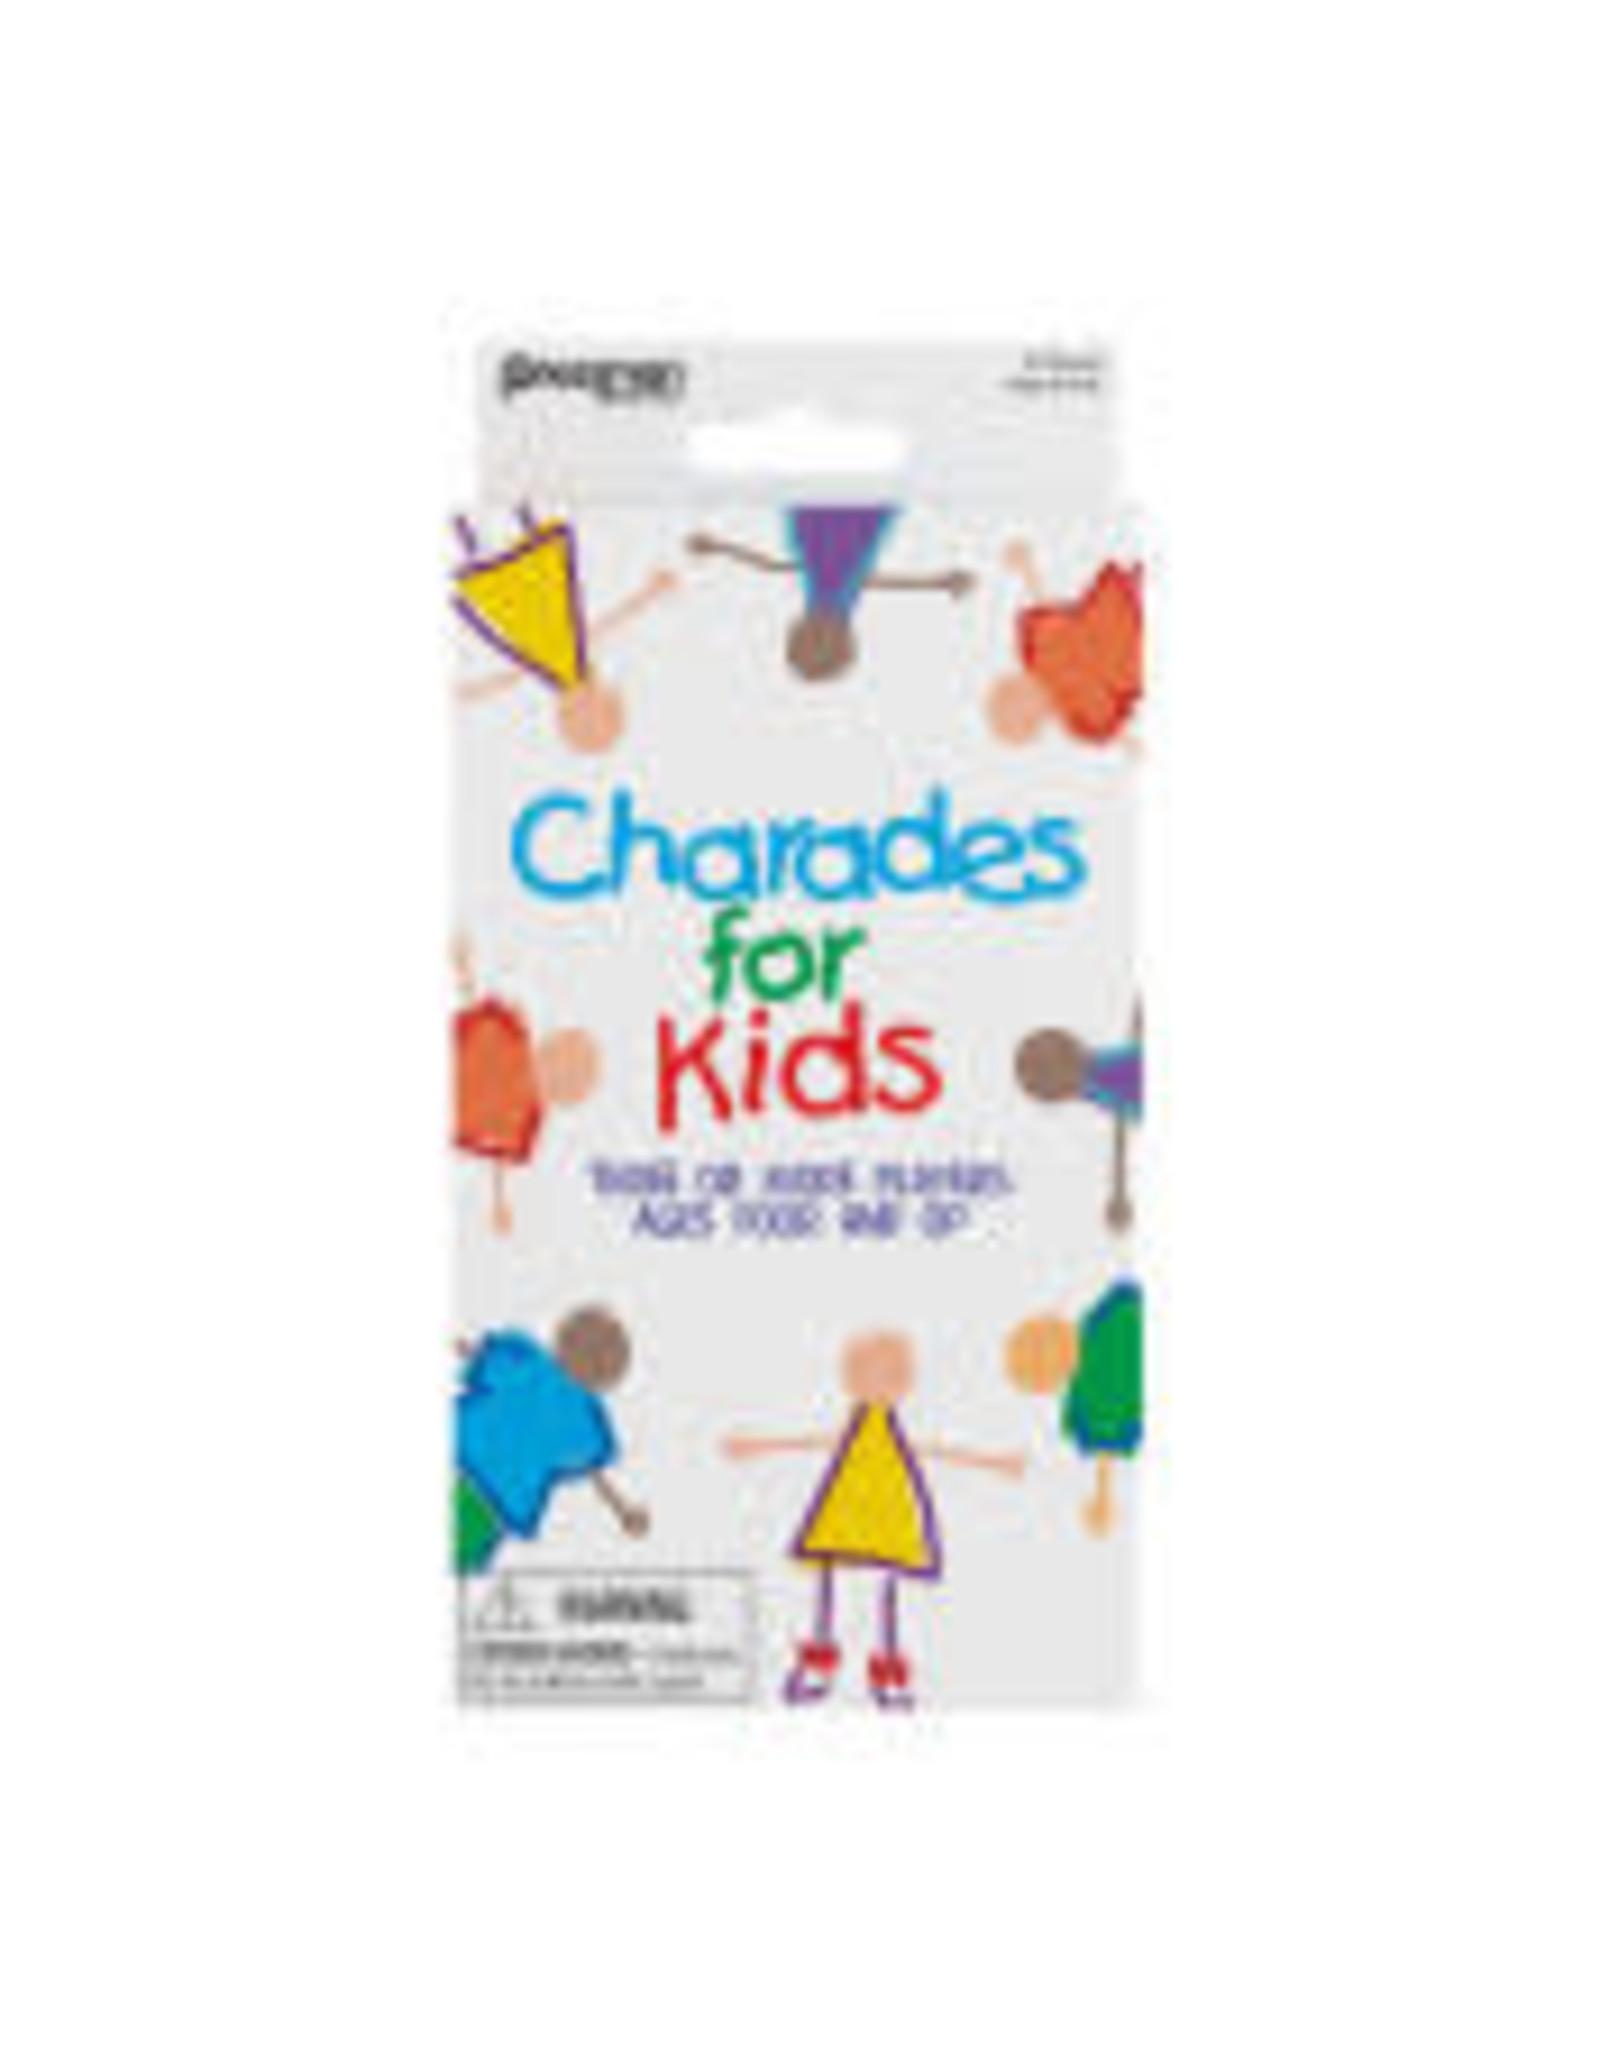 Goliath/Pressman Charades for KidsTM (Peggable)